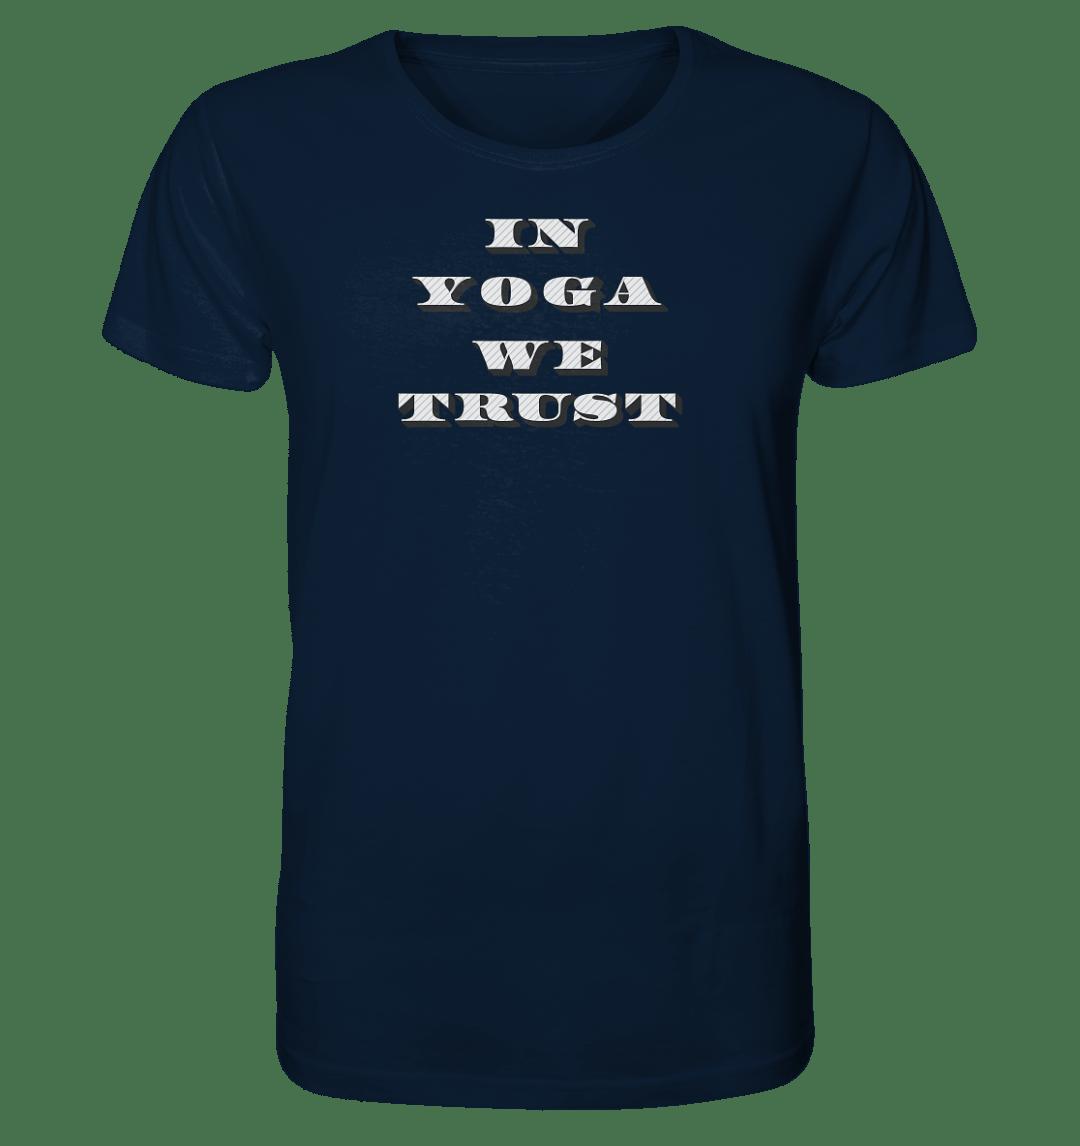 In Yoga We Trust - Organic Shirt